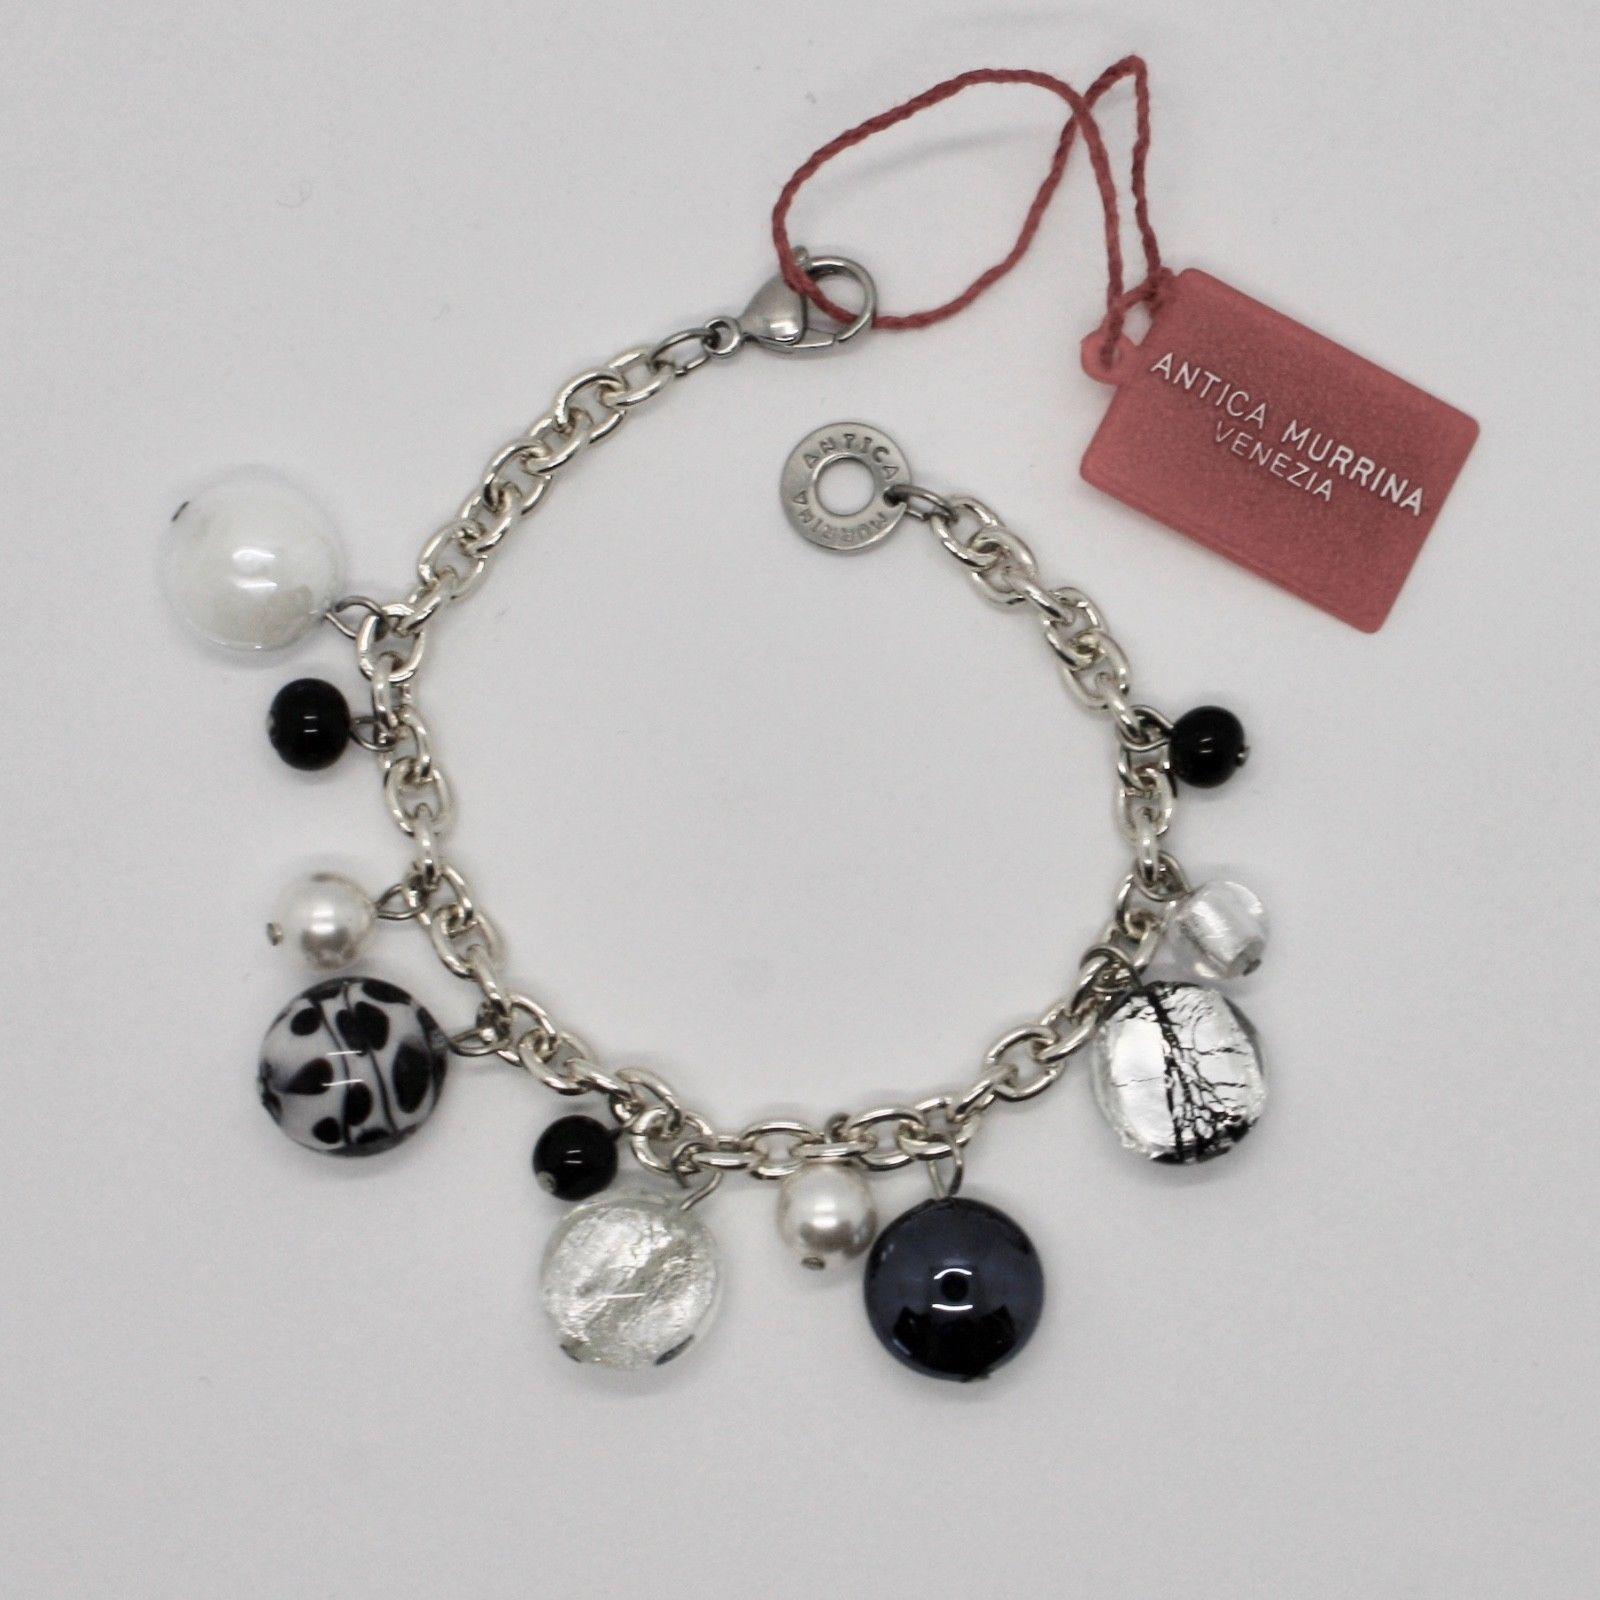 BRACELET ANTICA MURRINA VENEZIA WITH MURANO GLASS BLACK AND WHITE BR617A15